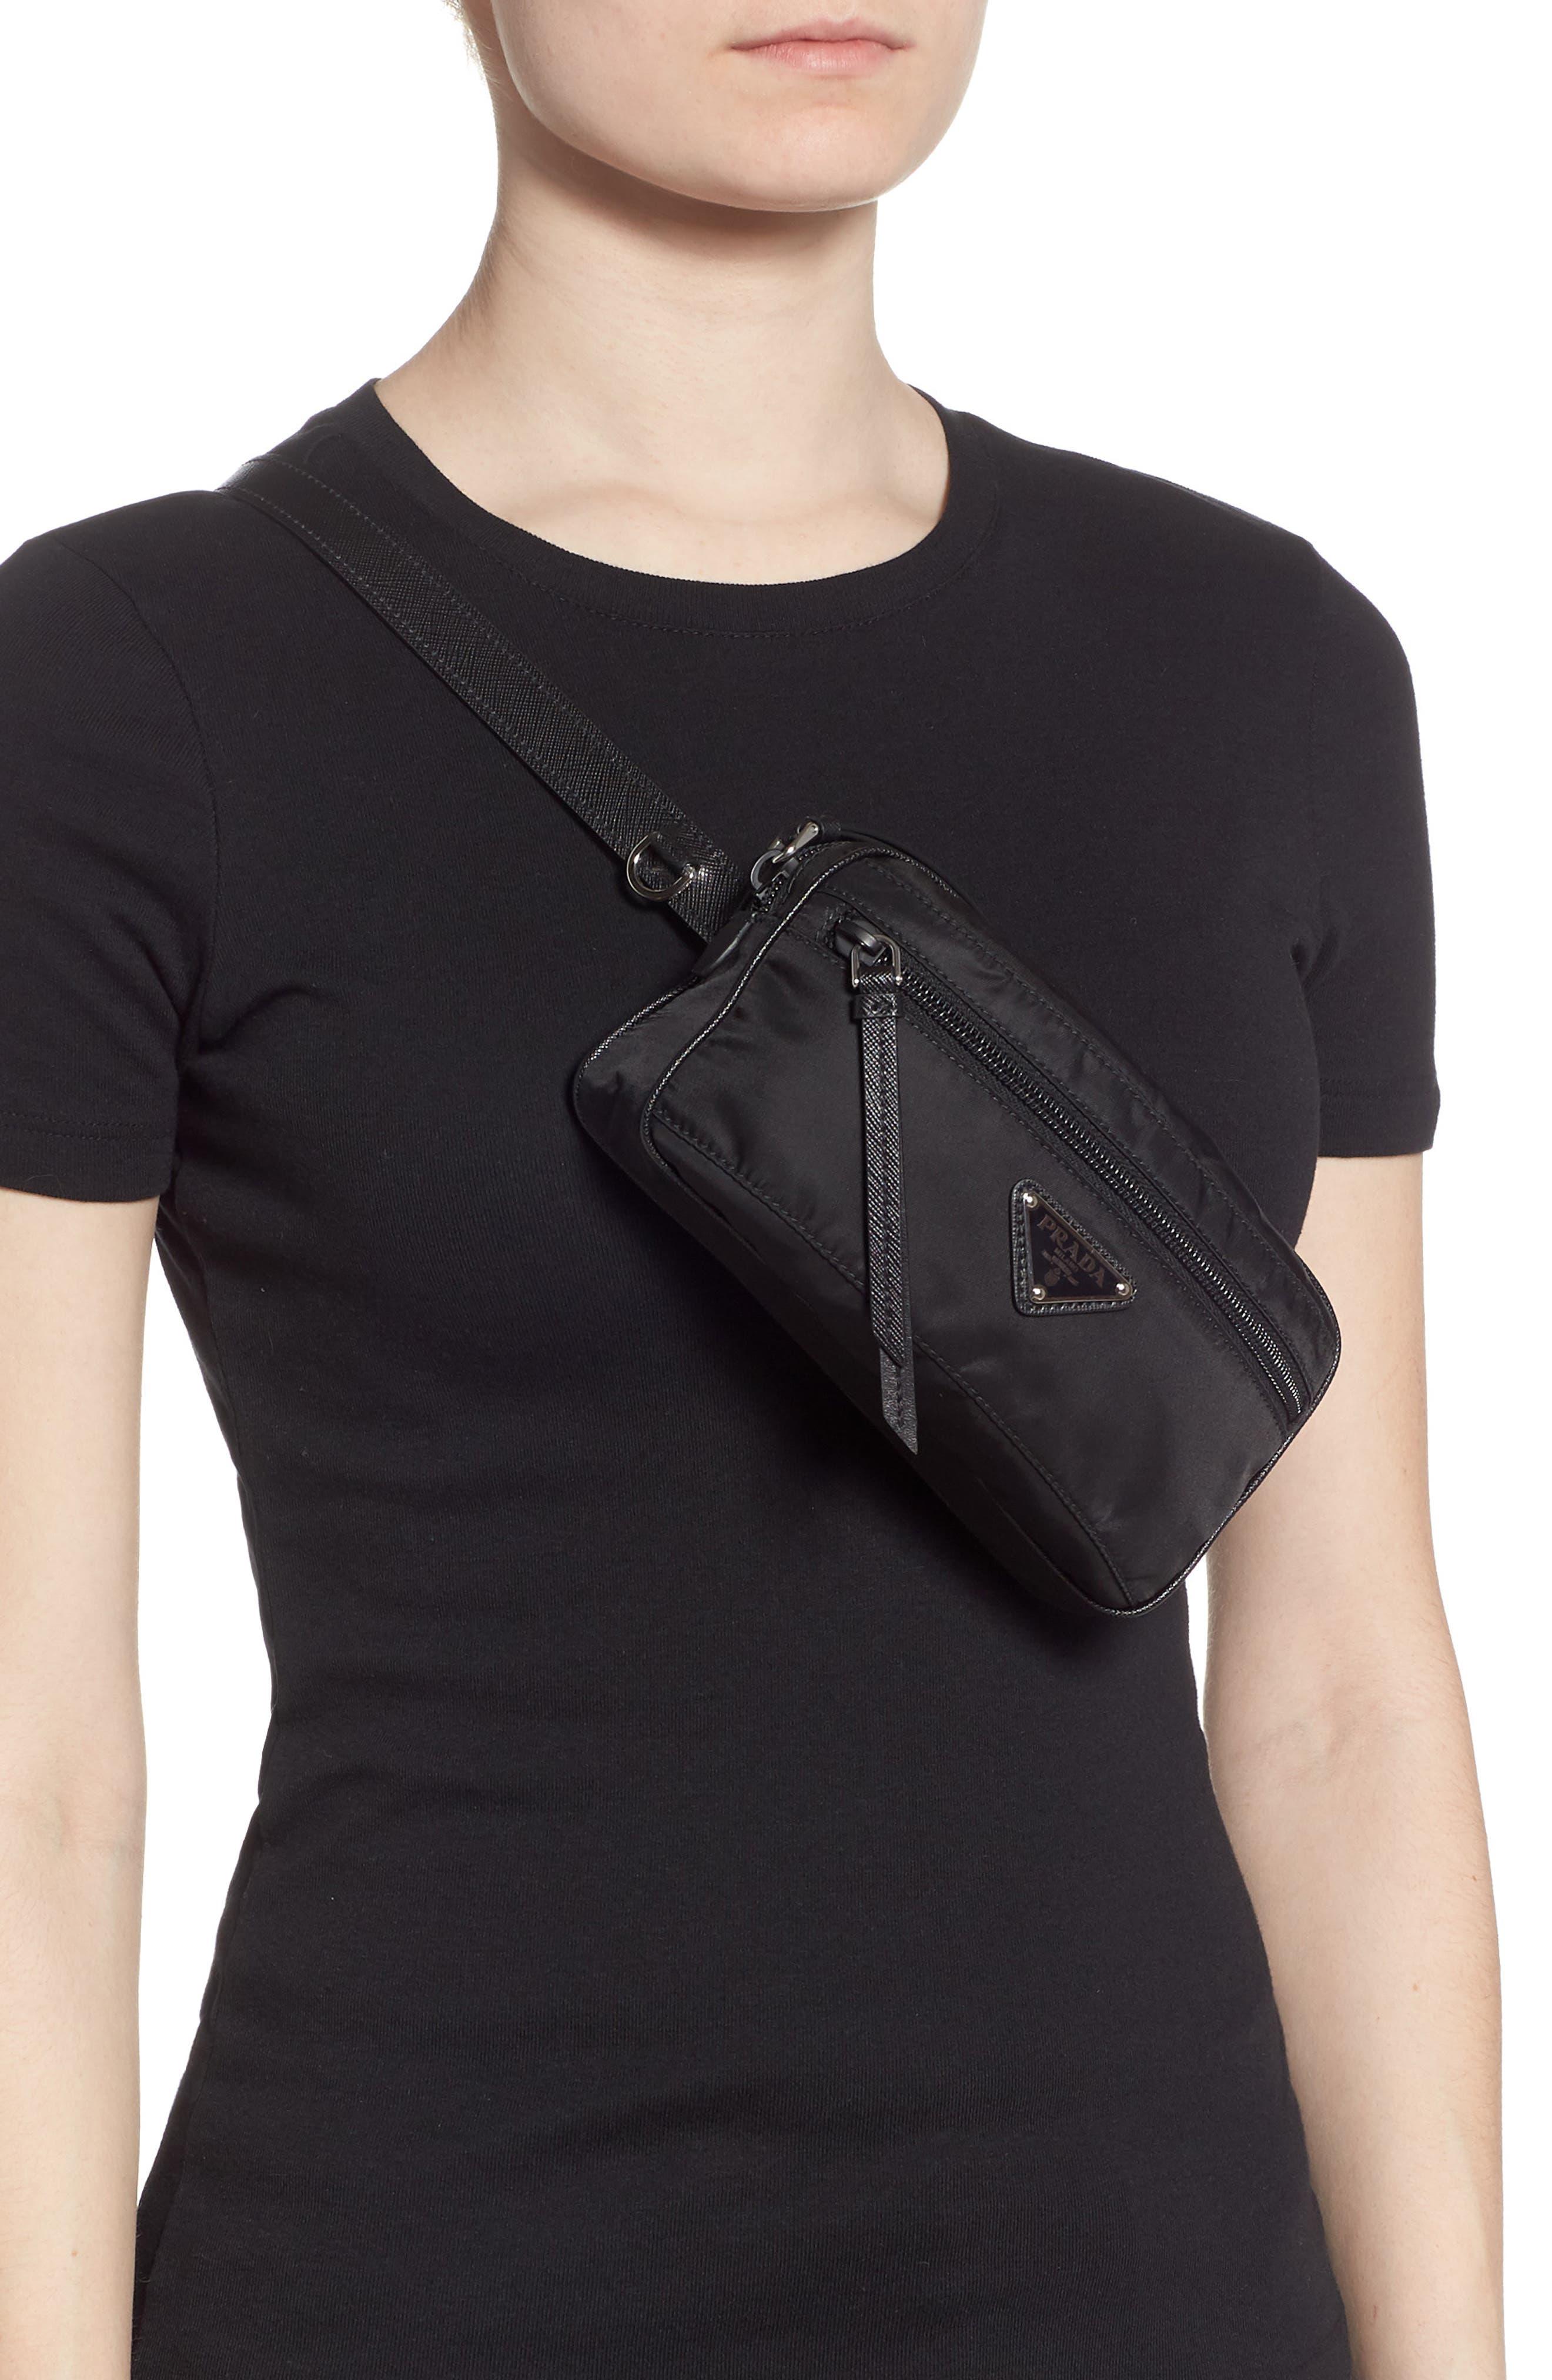 PRADA,                             Small Nylon Belt Bag,                             Alternate thumbnail 3, color,                             NERO